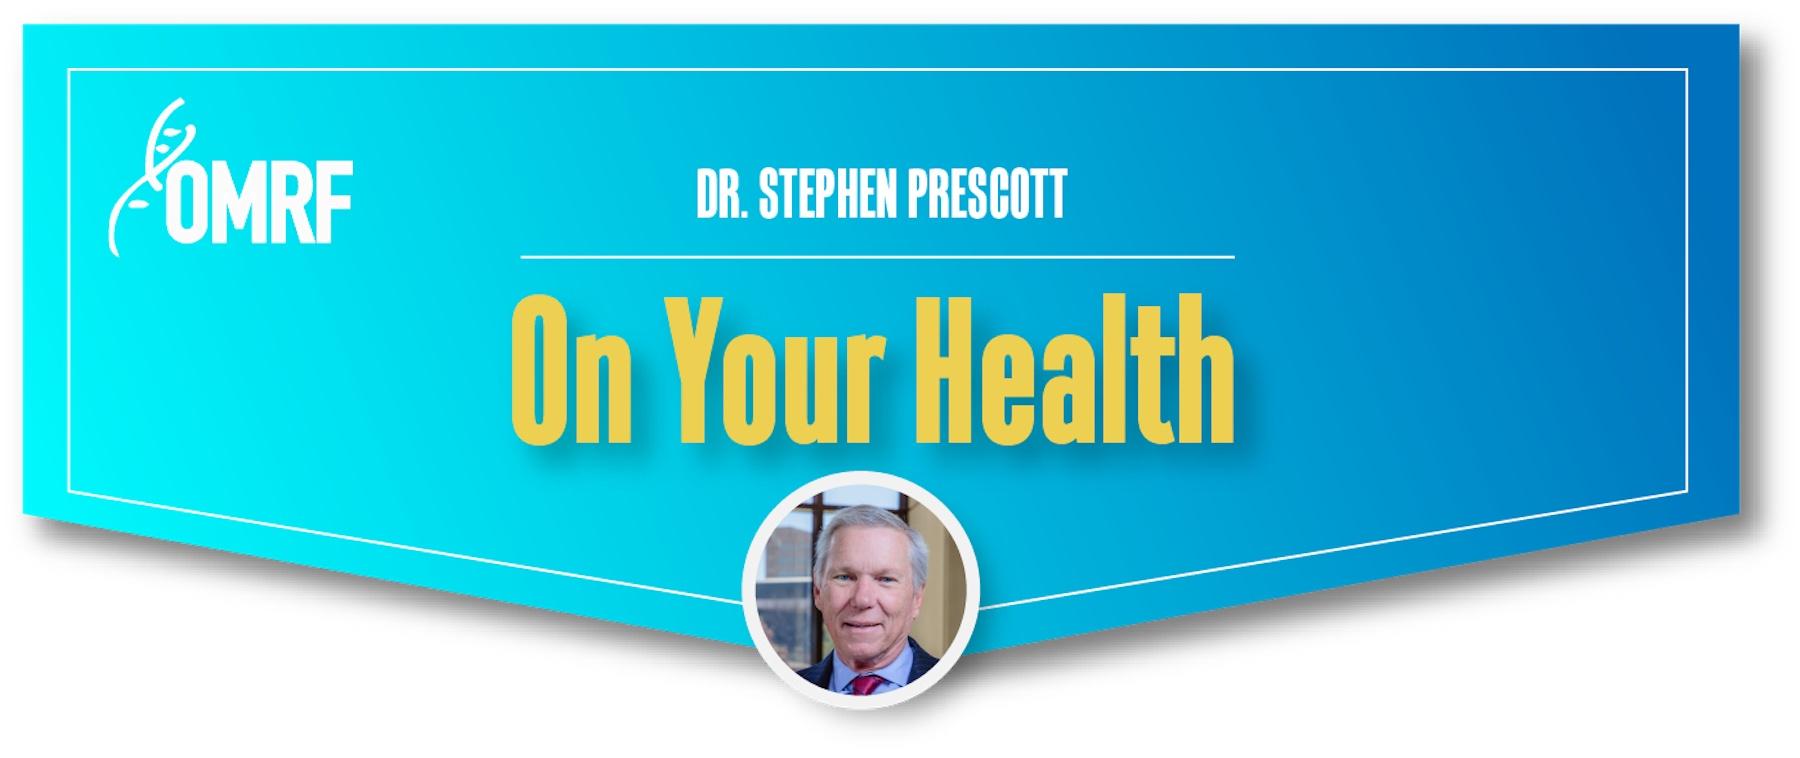 Dr. Stephen Prescott On Your Health